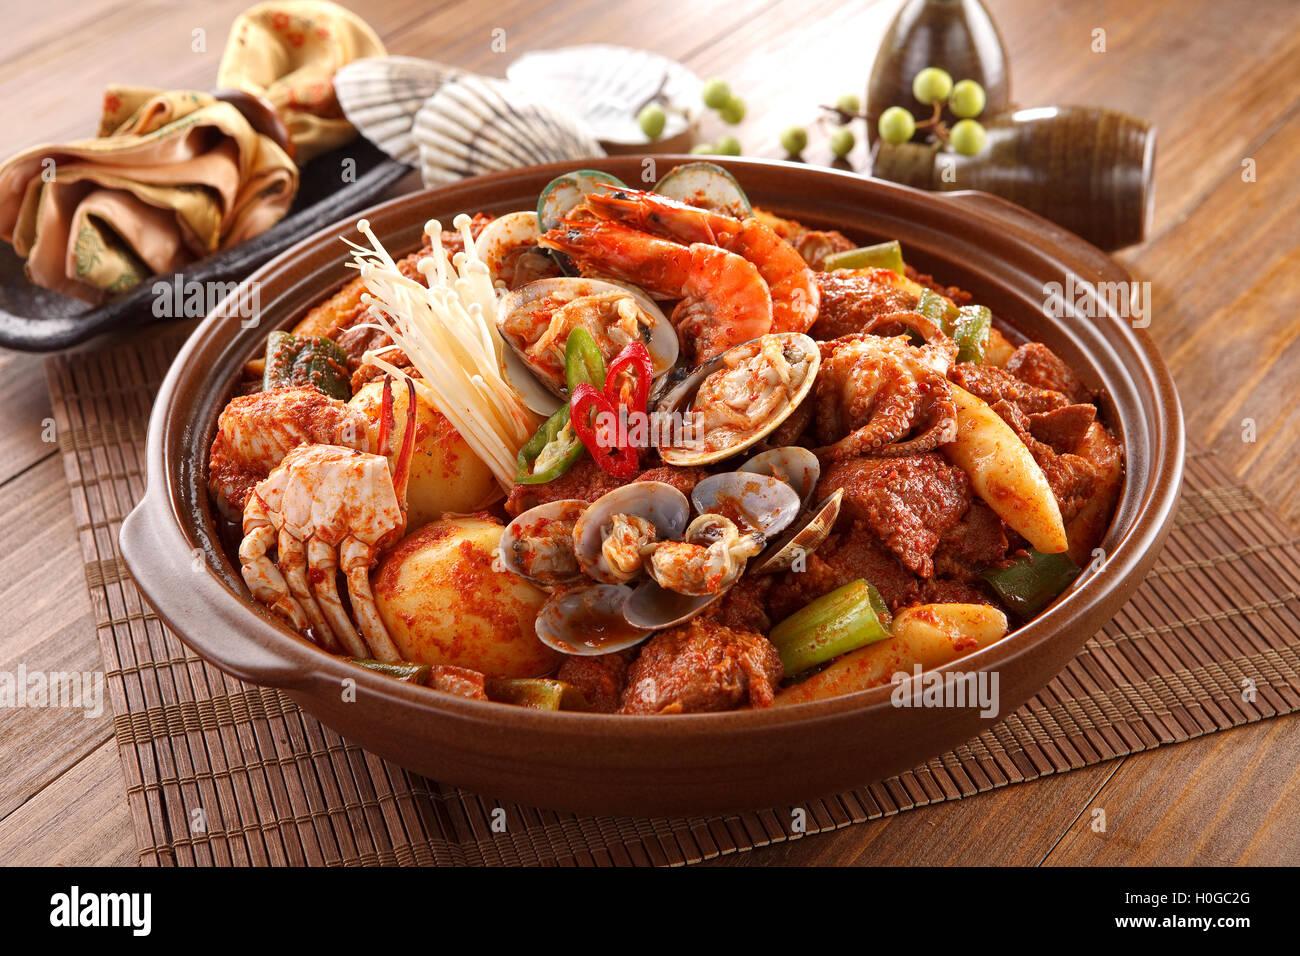 Big Bowl Of Spicy Seafood Galbijjim With Clams Shrimp Octopus Crab Potatoes